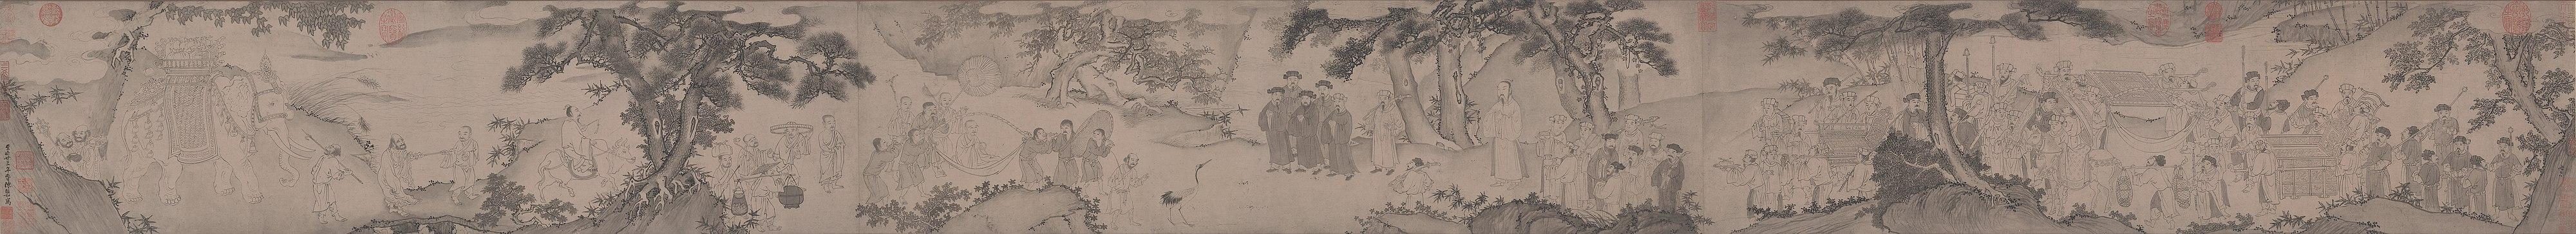 The Mahasattva of Truc Lam leaves the Mountain 竹林大士出山圖.jpg